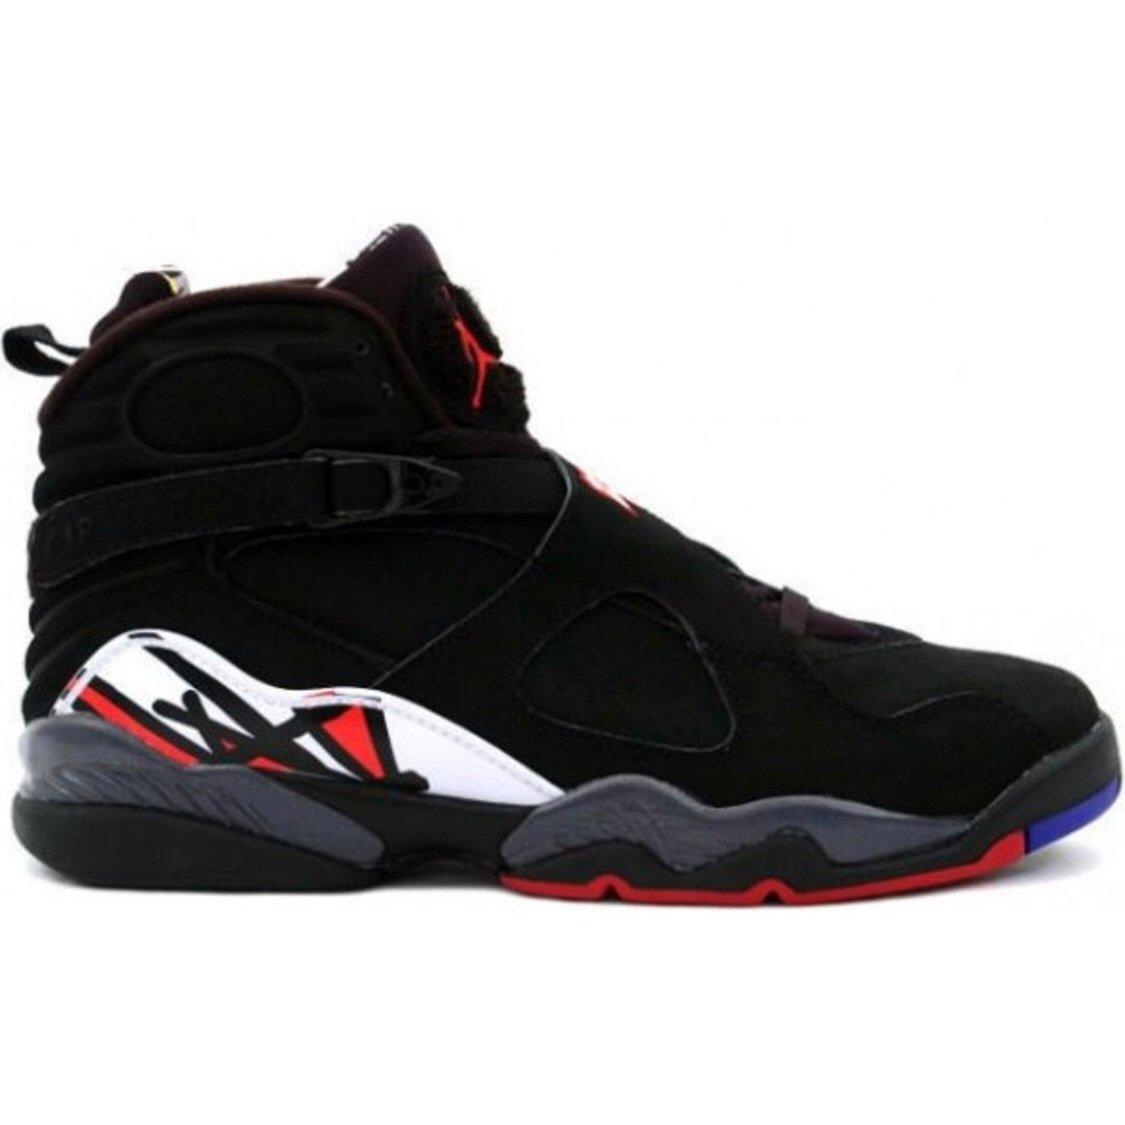 Michael Jordan's Air Jordan 8 Shoes